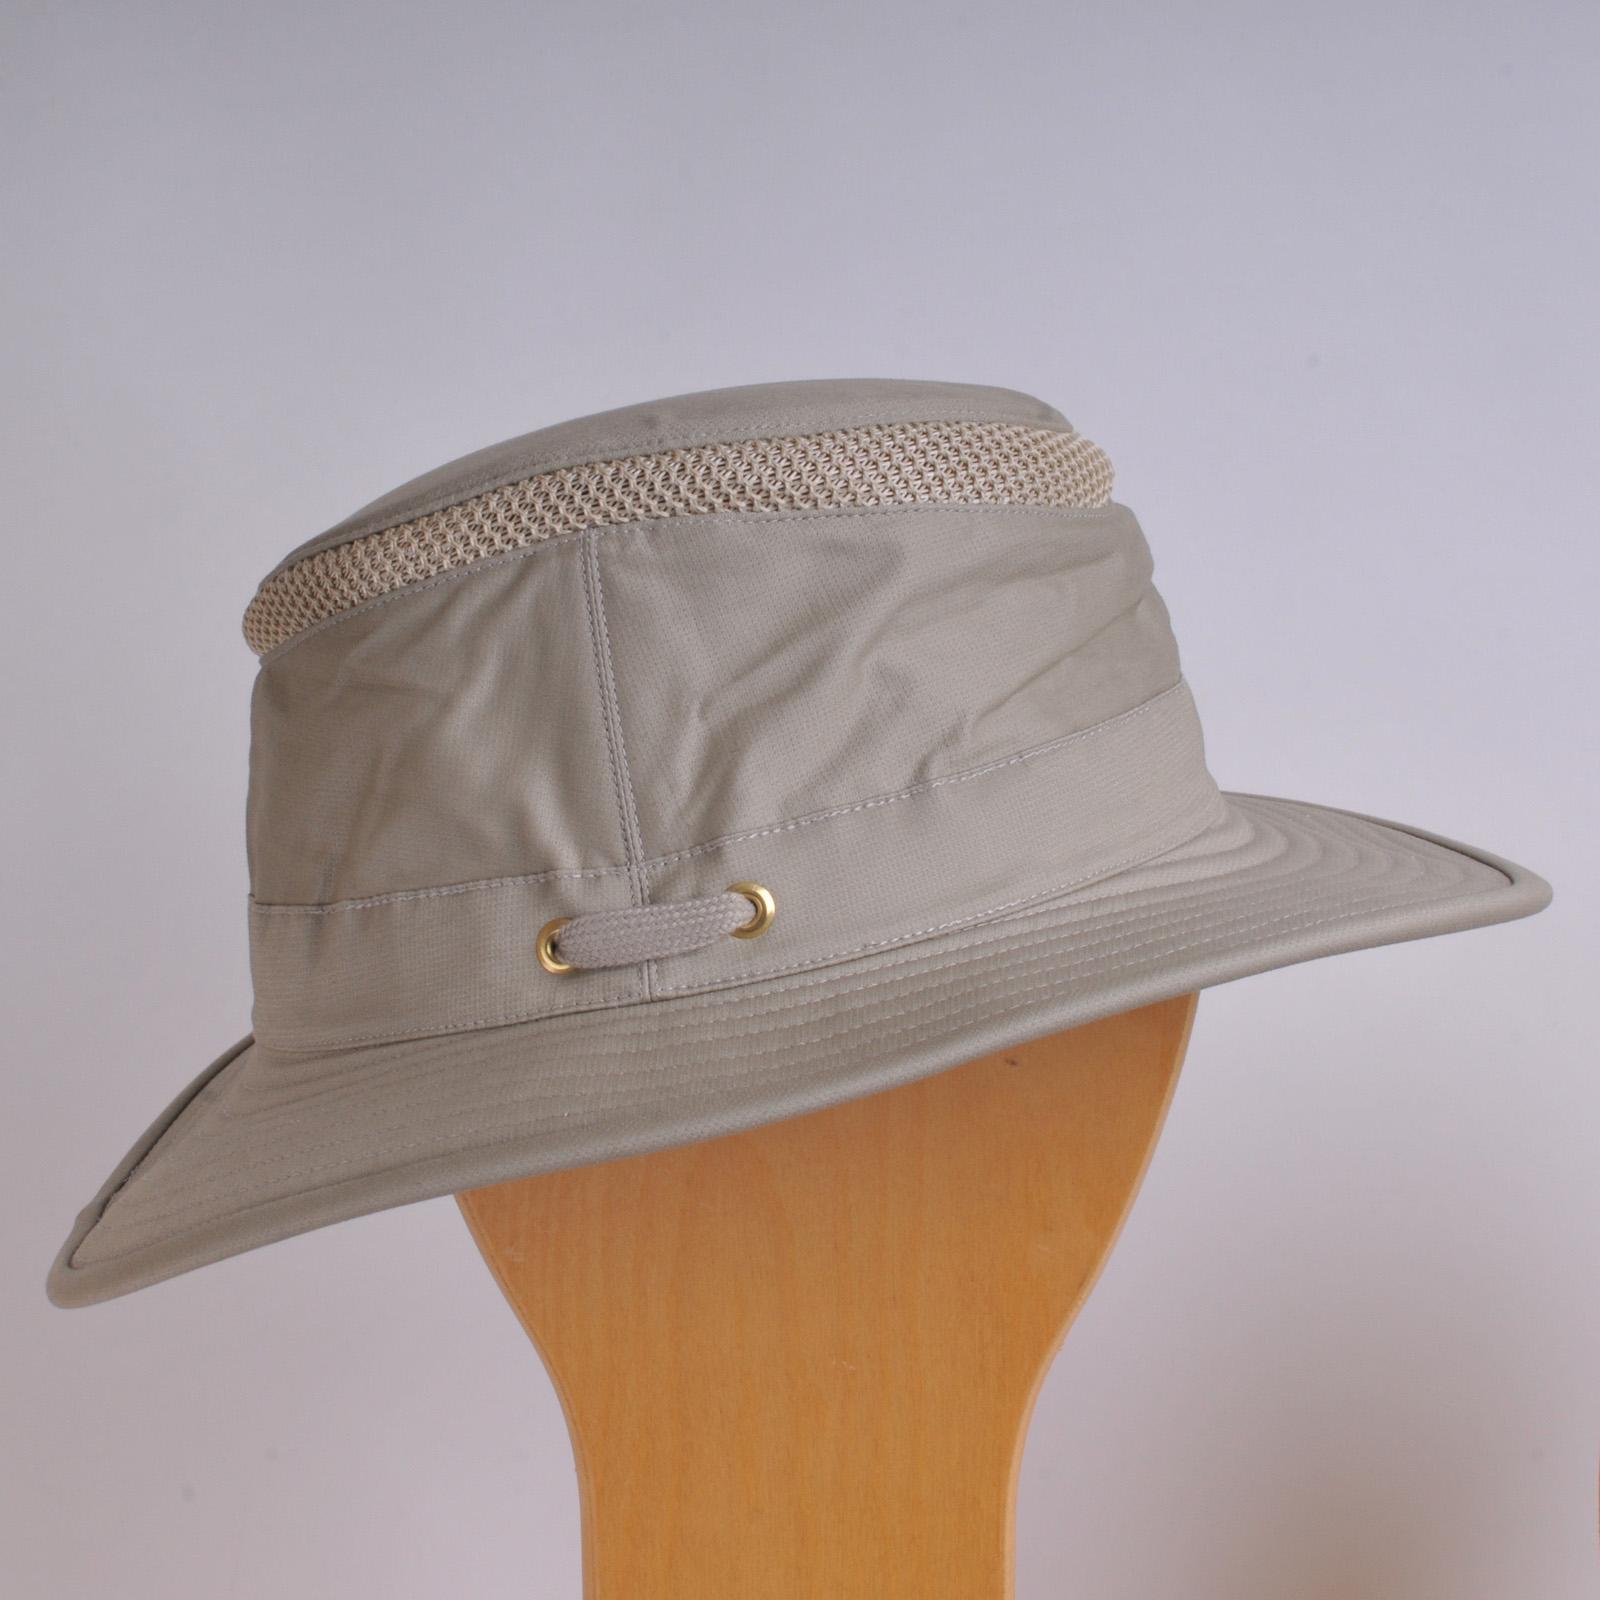 Tilley Hats Organic Airflo Tilley Hat T5mo Khaki